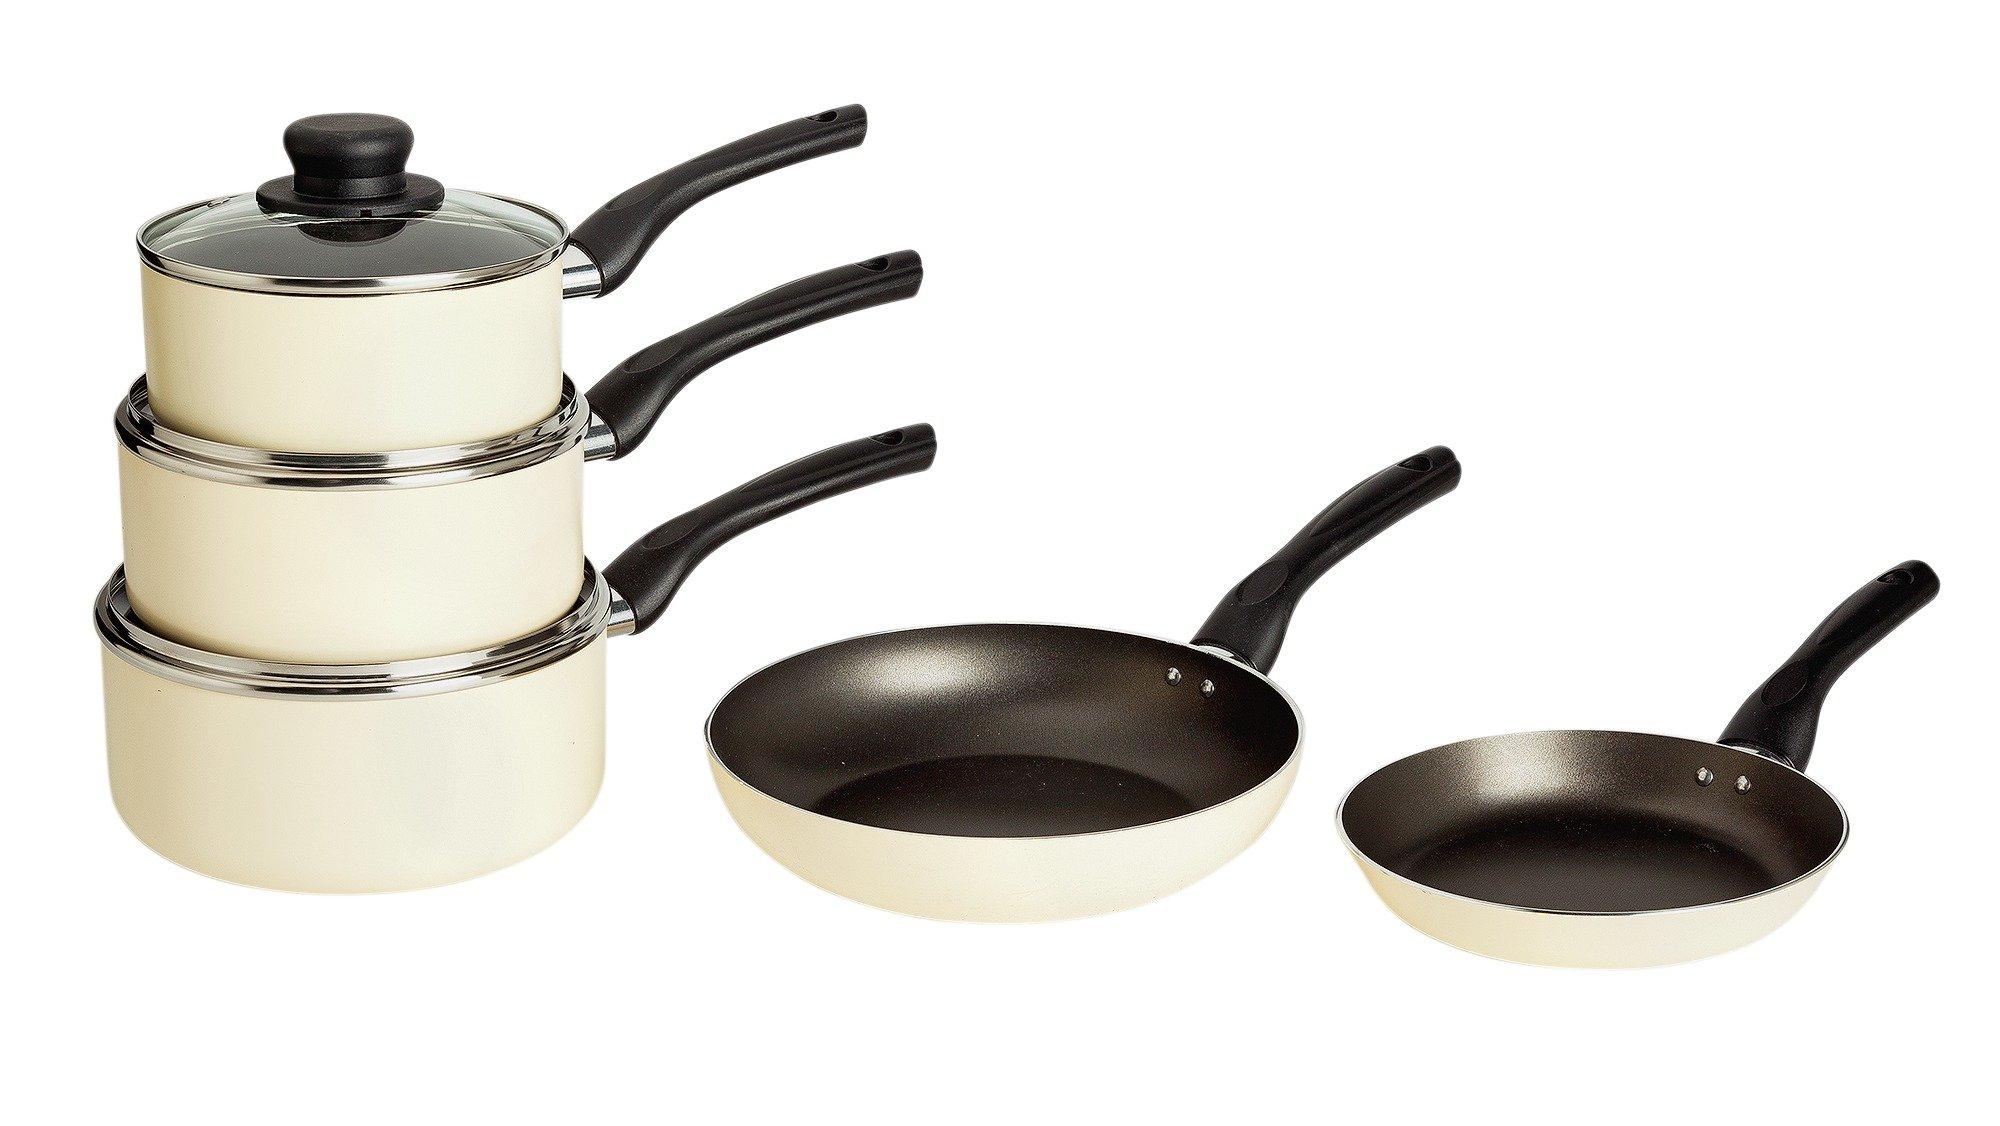 Argos Home Aluminium Non-Stick 5 Piece Pan Set - Cream